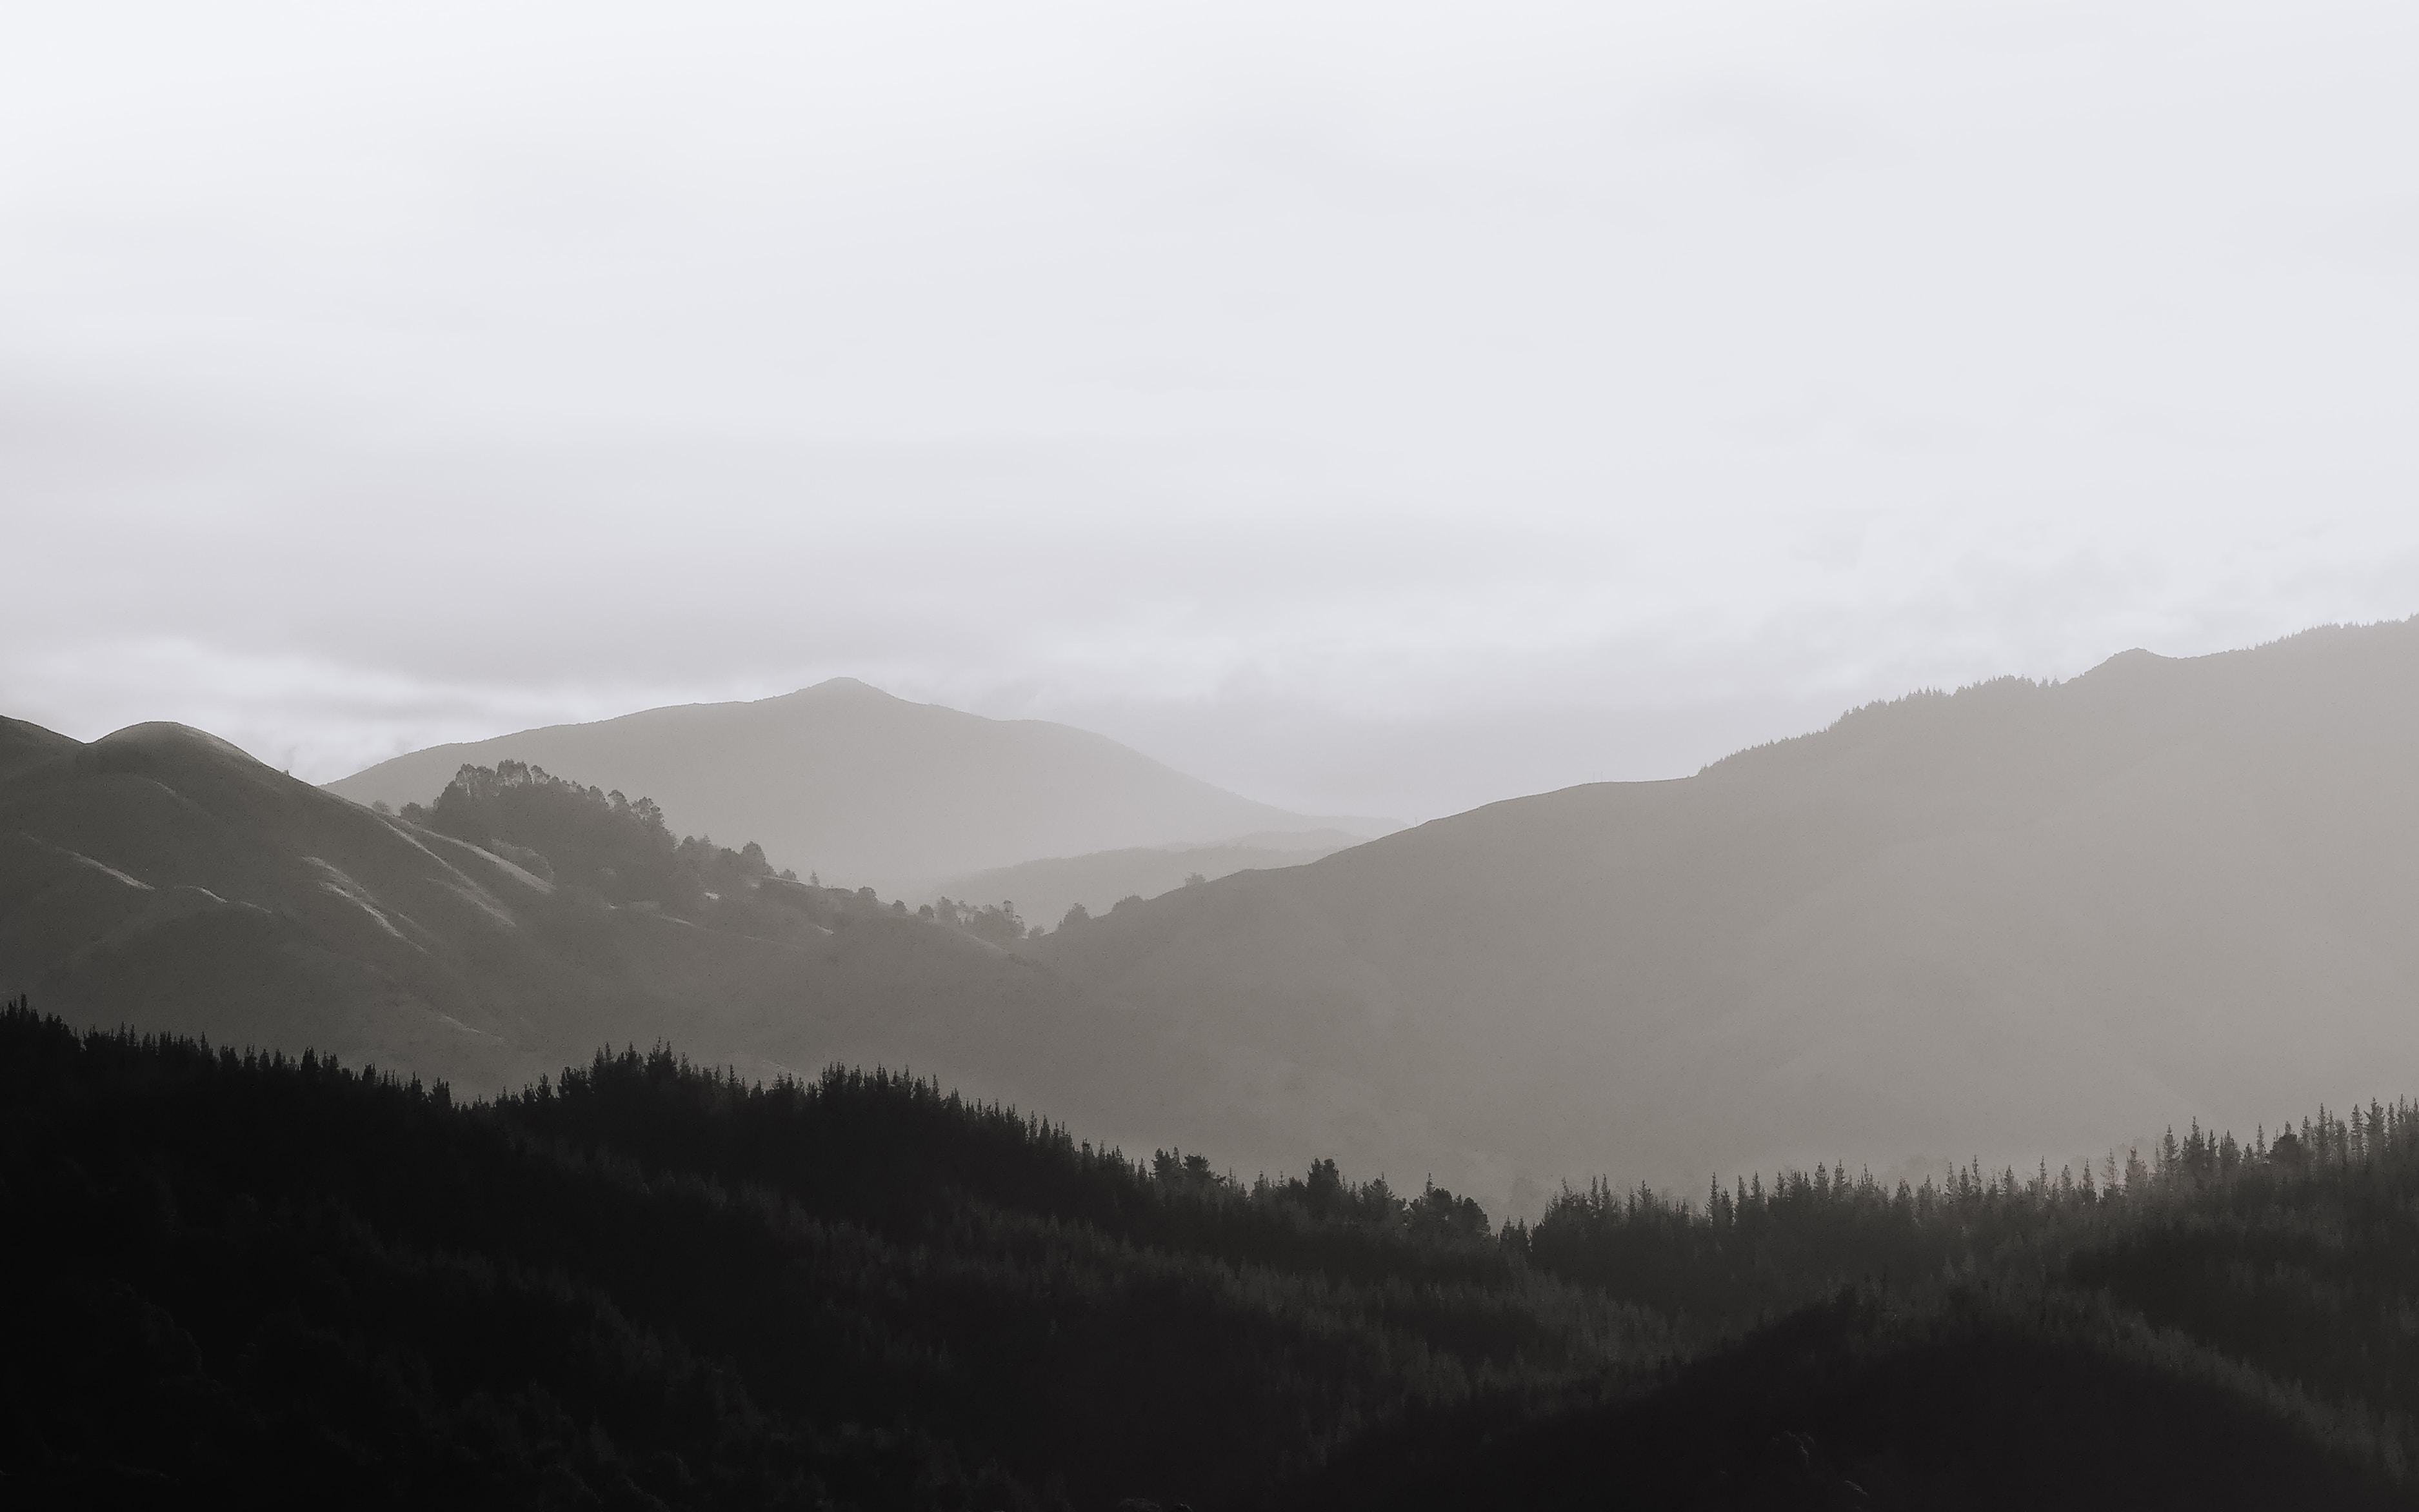 fog beneath a forest